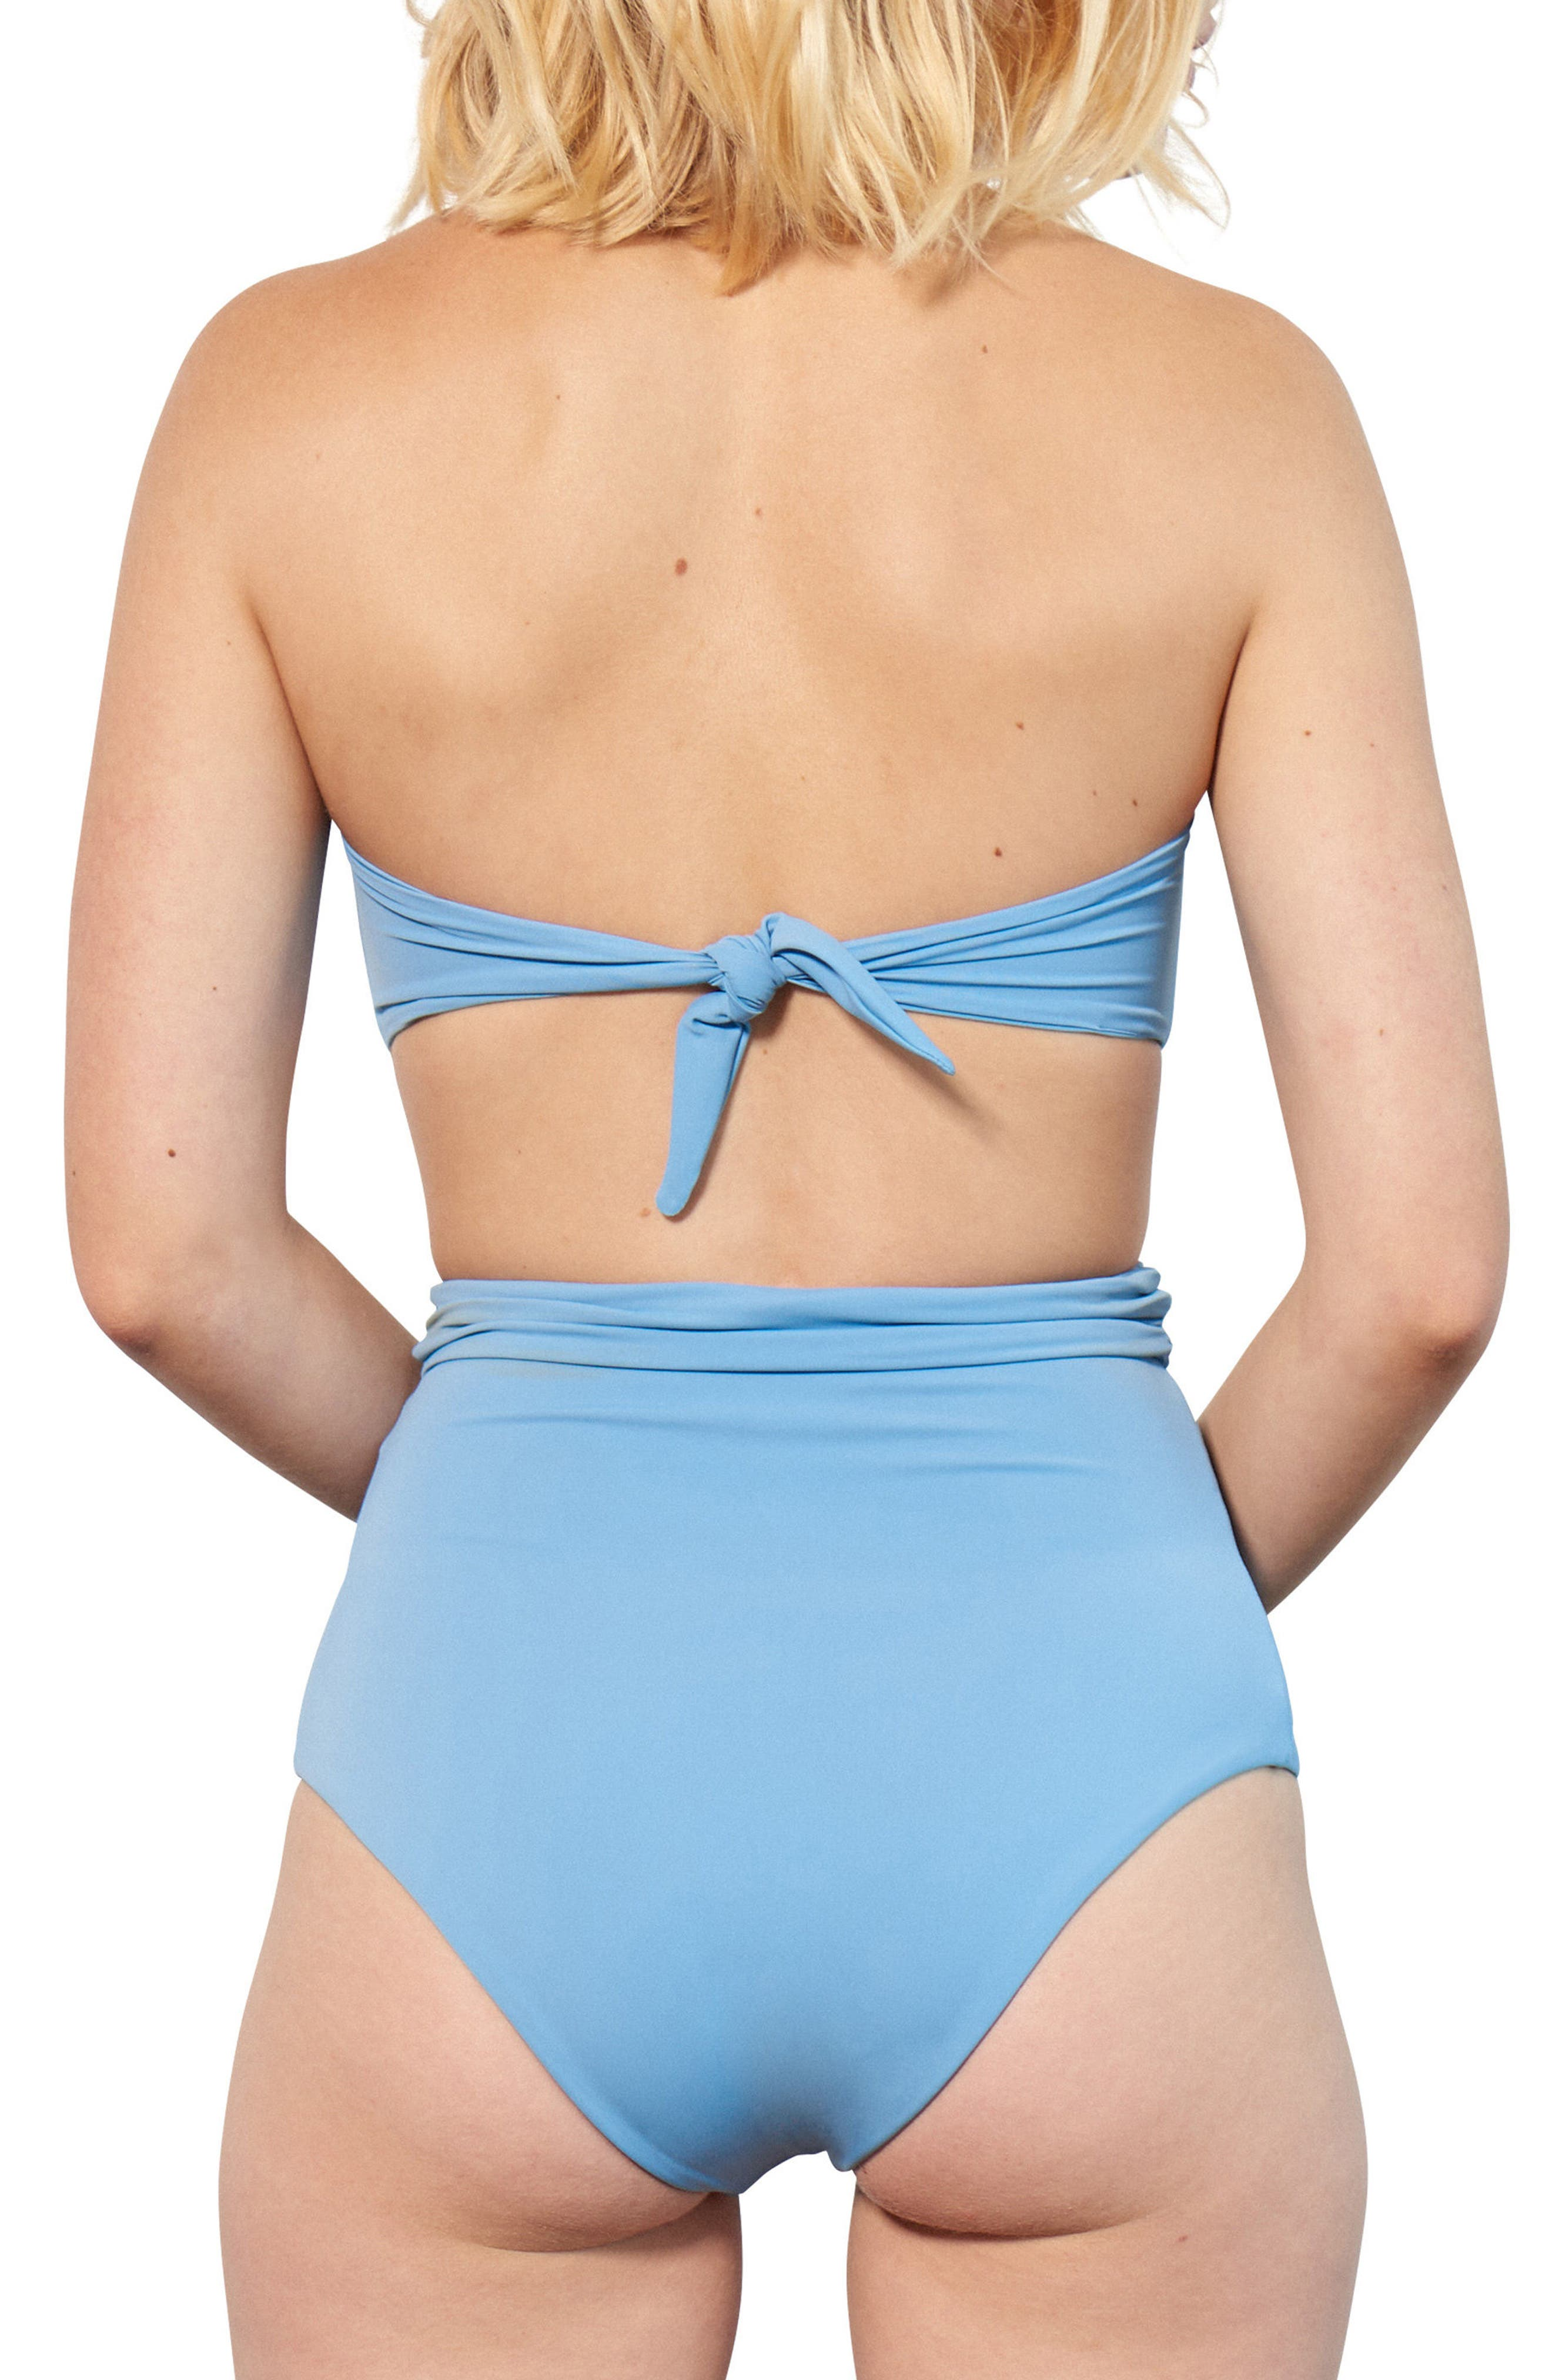 Chey Twist Bikini Top,                             Alternate thumbnail 3, color,                             Vento